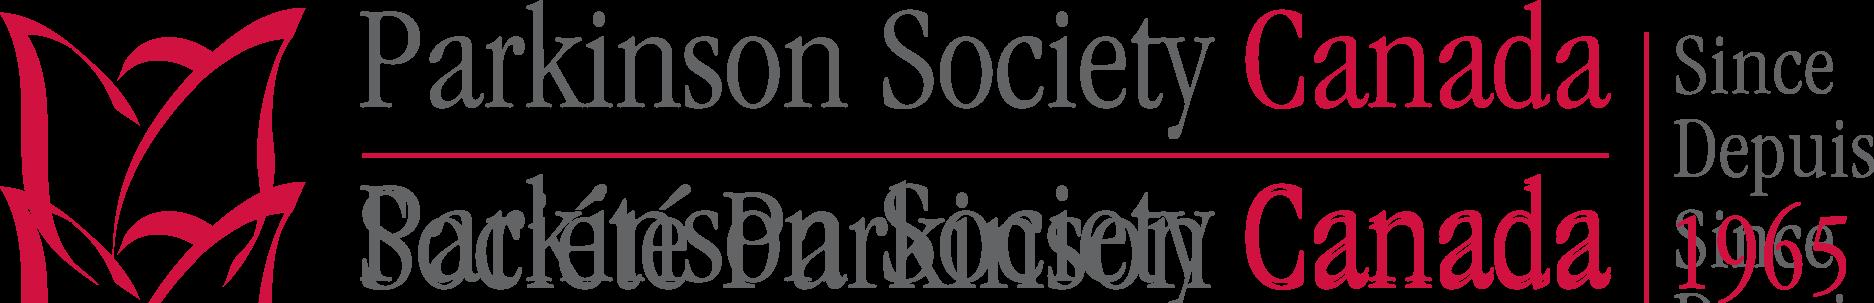 Parkinsons Society of Canada